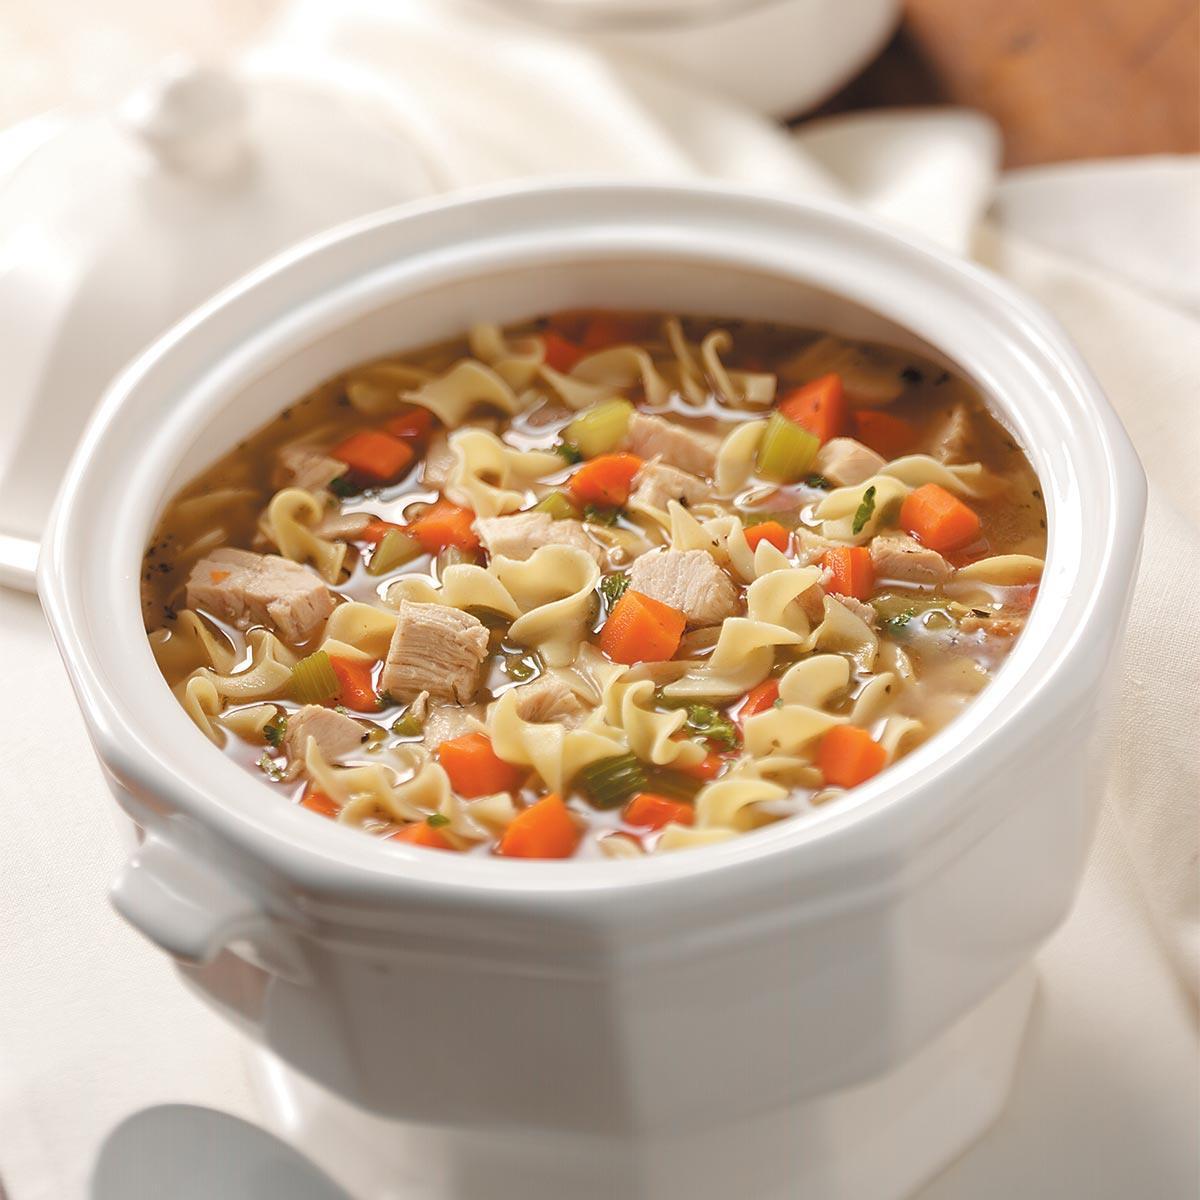 Turkey Soup pictures